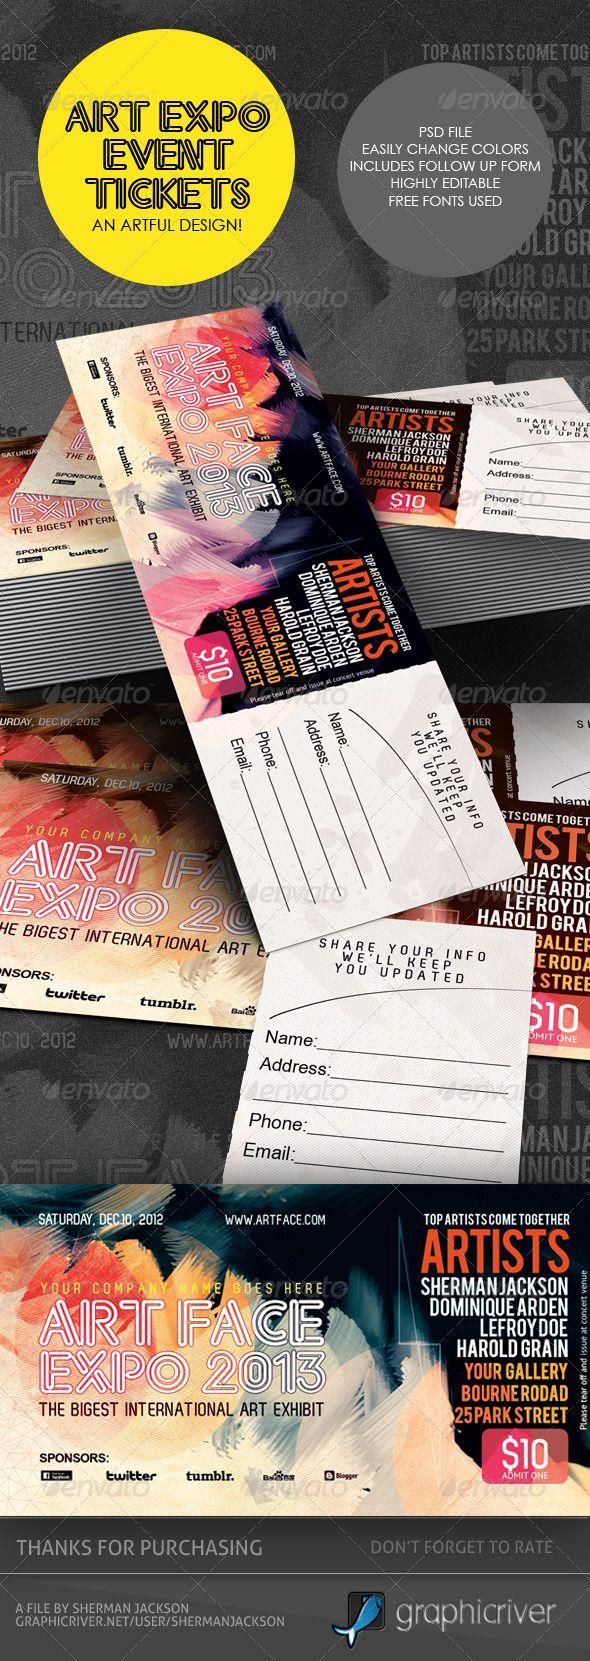 Art Expo Art Show Event Tickets Passes Template Ticket Design Art Show Event Tickets Design